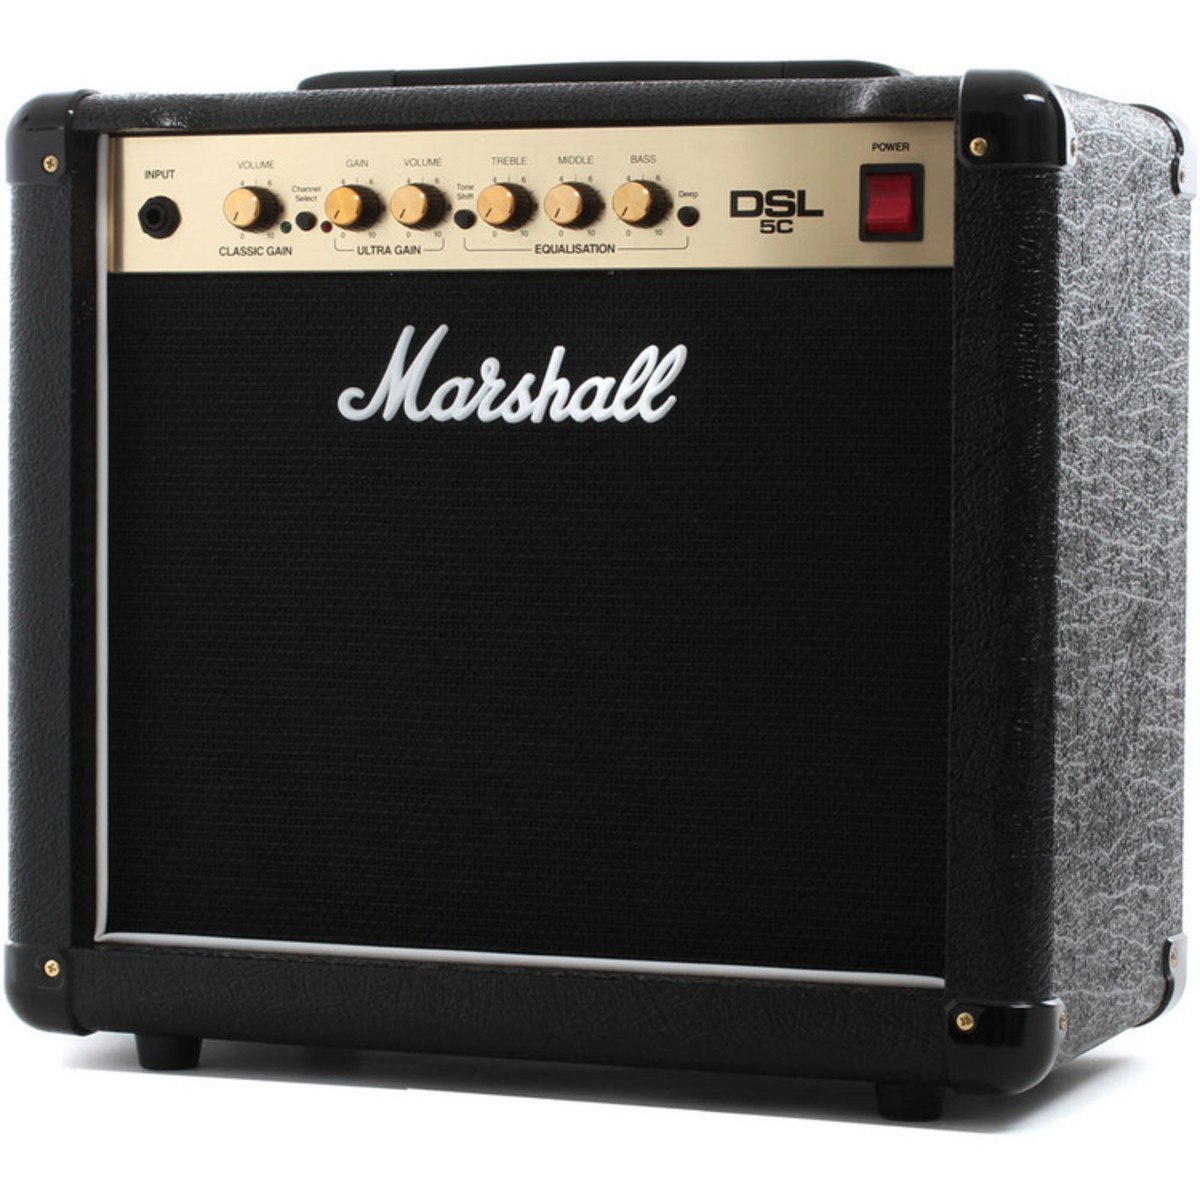 marshall dsl5c valve 2 channel 1x10in guitar combo amp at. Black Bedroom Furniture Sets. Home Design Ideas